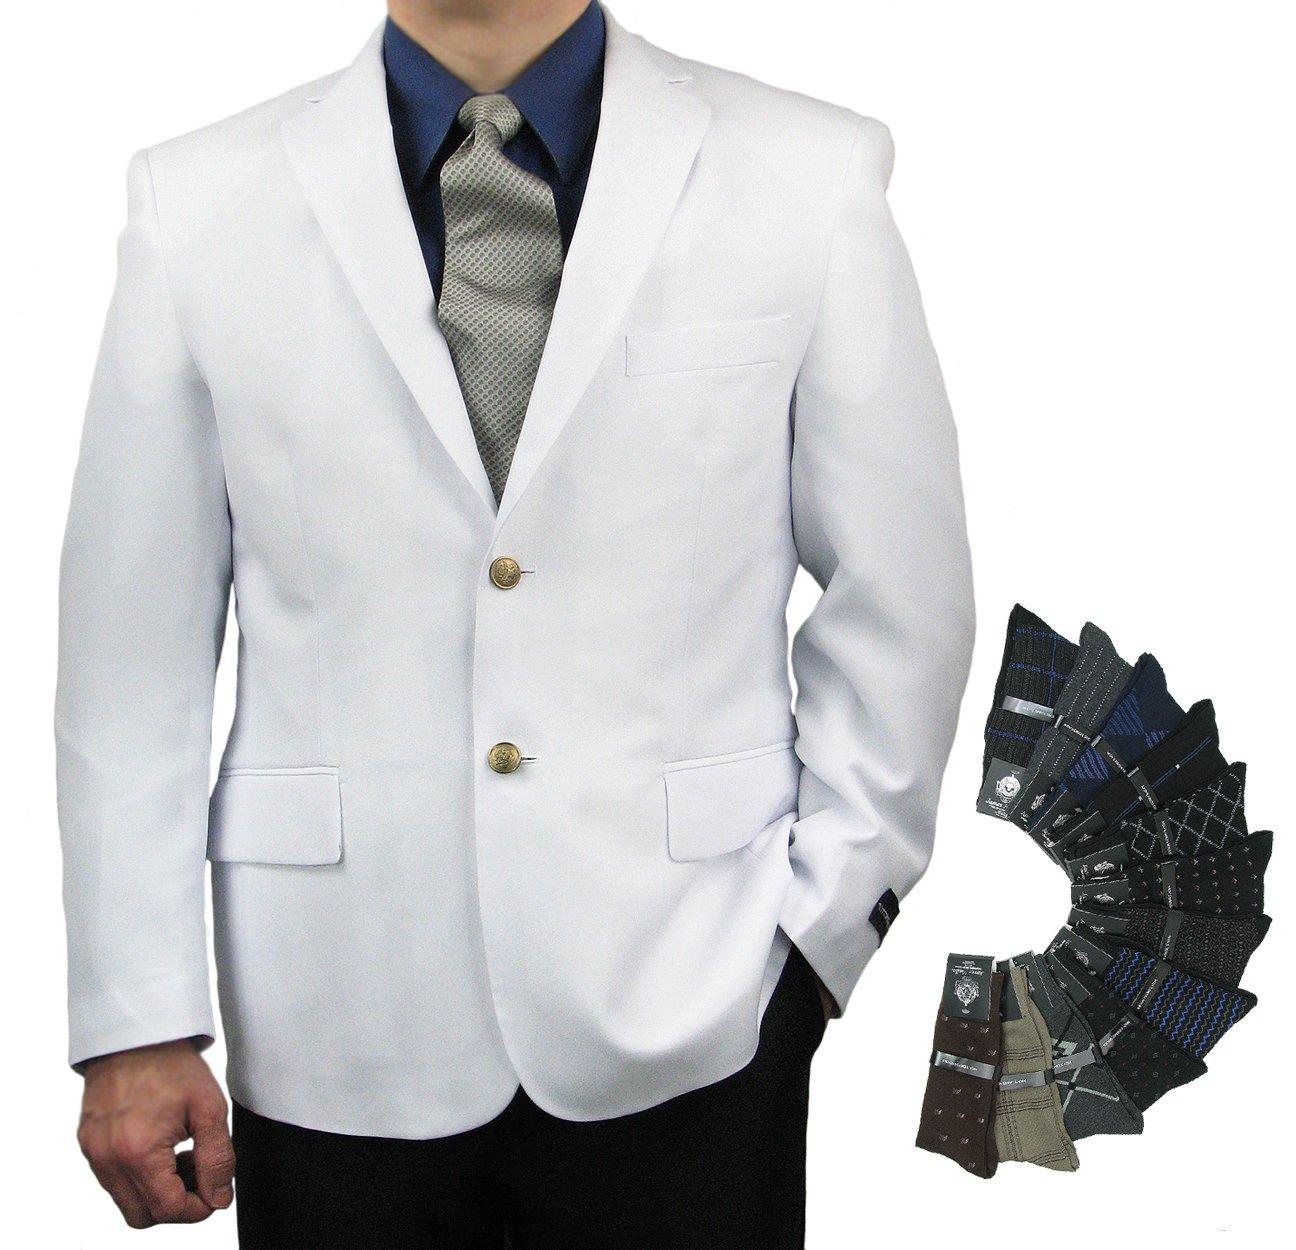 Mens Classic Fit Single-Breasted Blazer & 1 Pair Of Dress Socks - White 44L